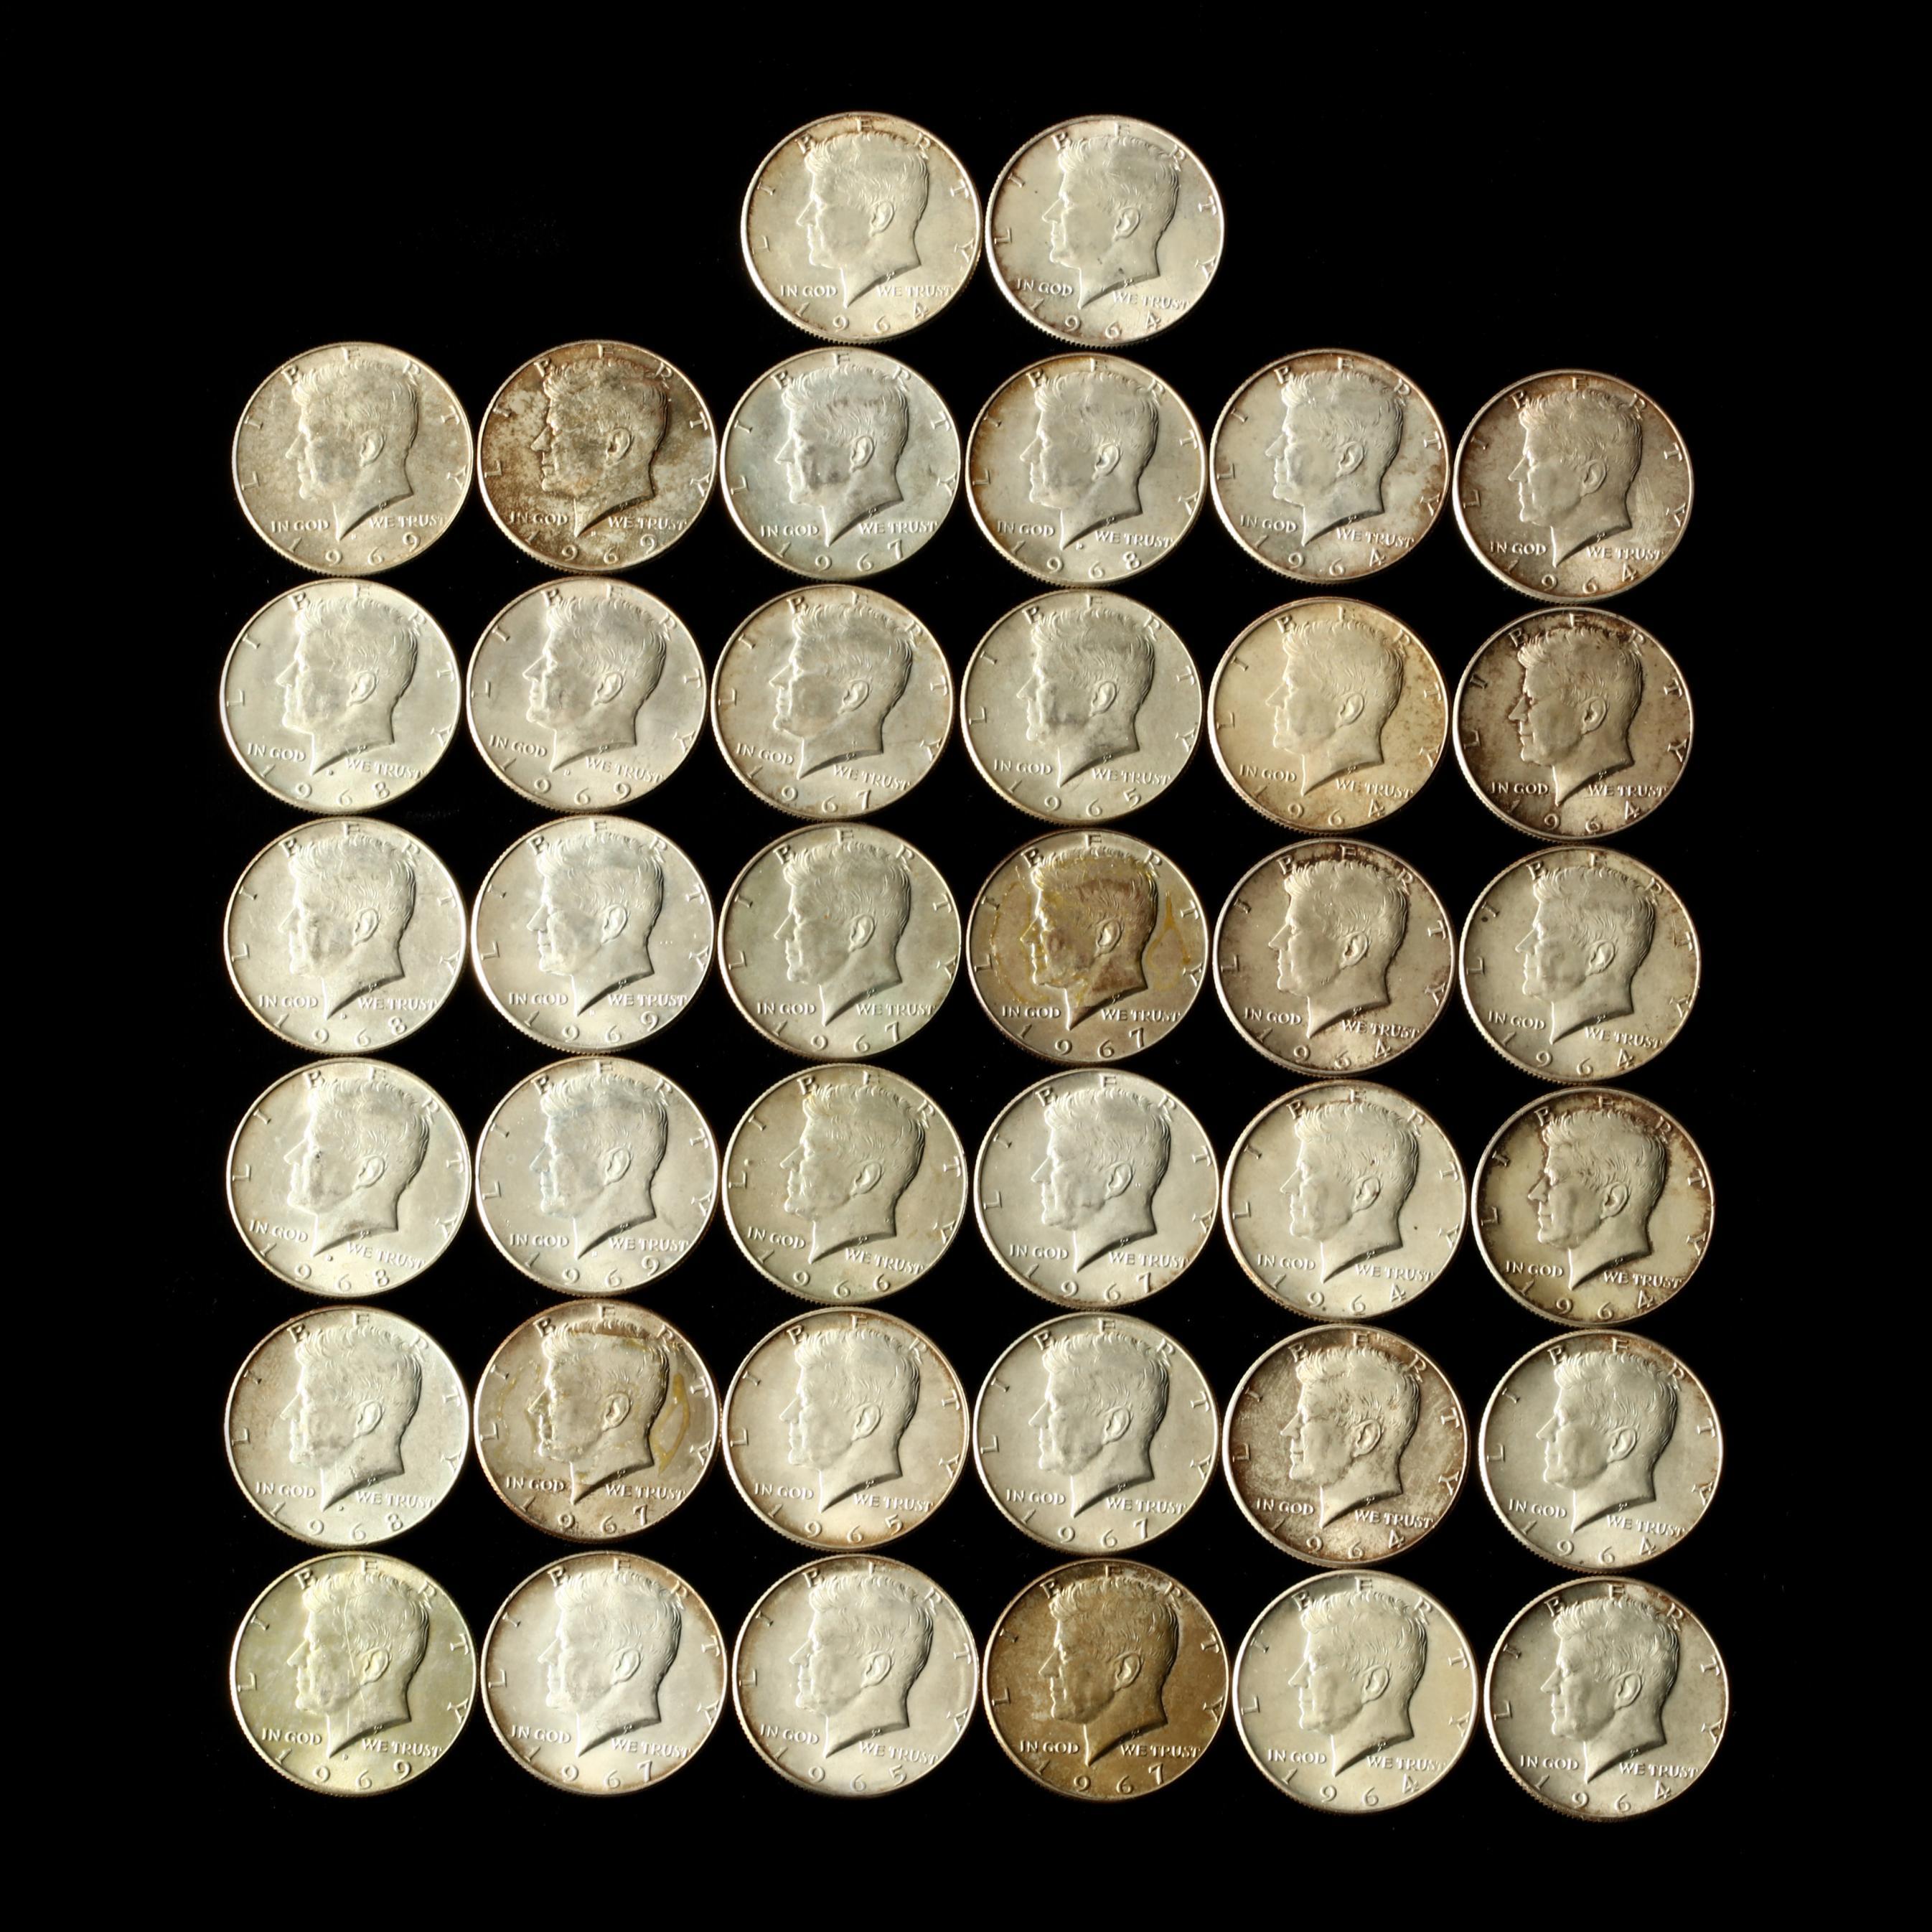 fourteen-1964-kennedy-halves-and-24-40-silver-kennedy-halves